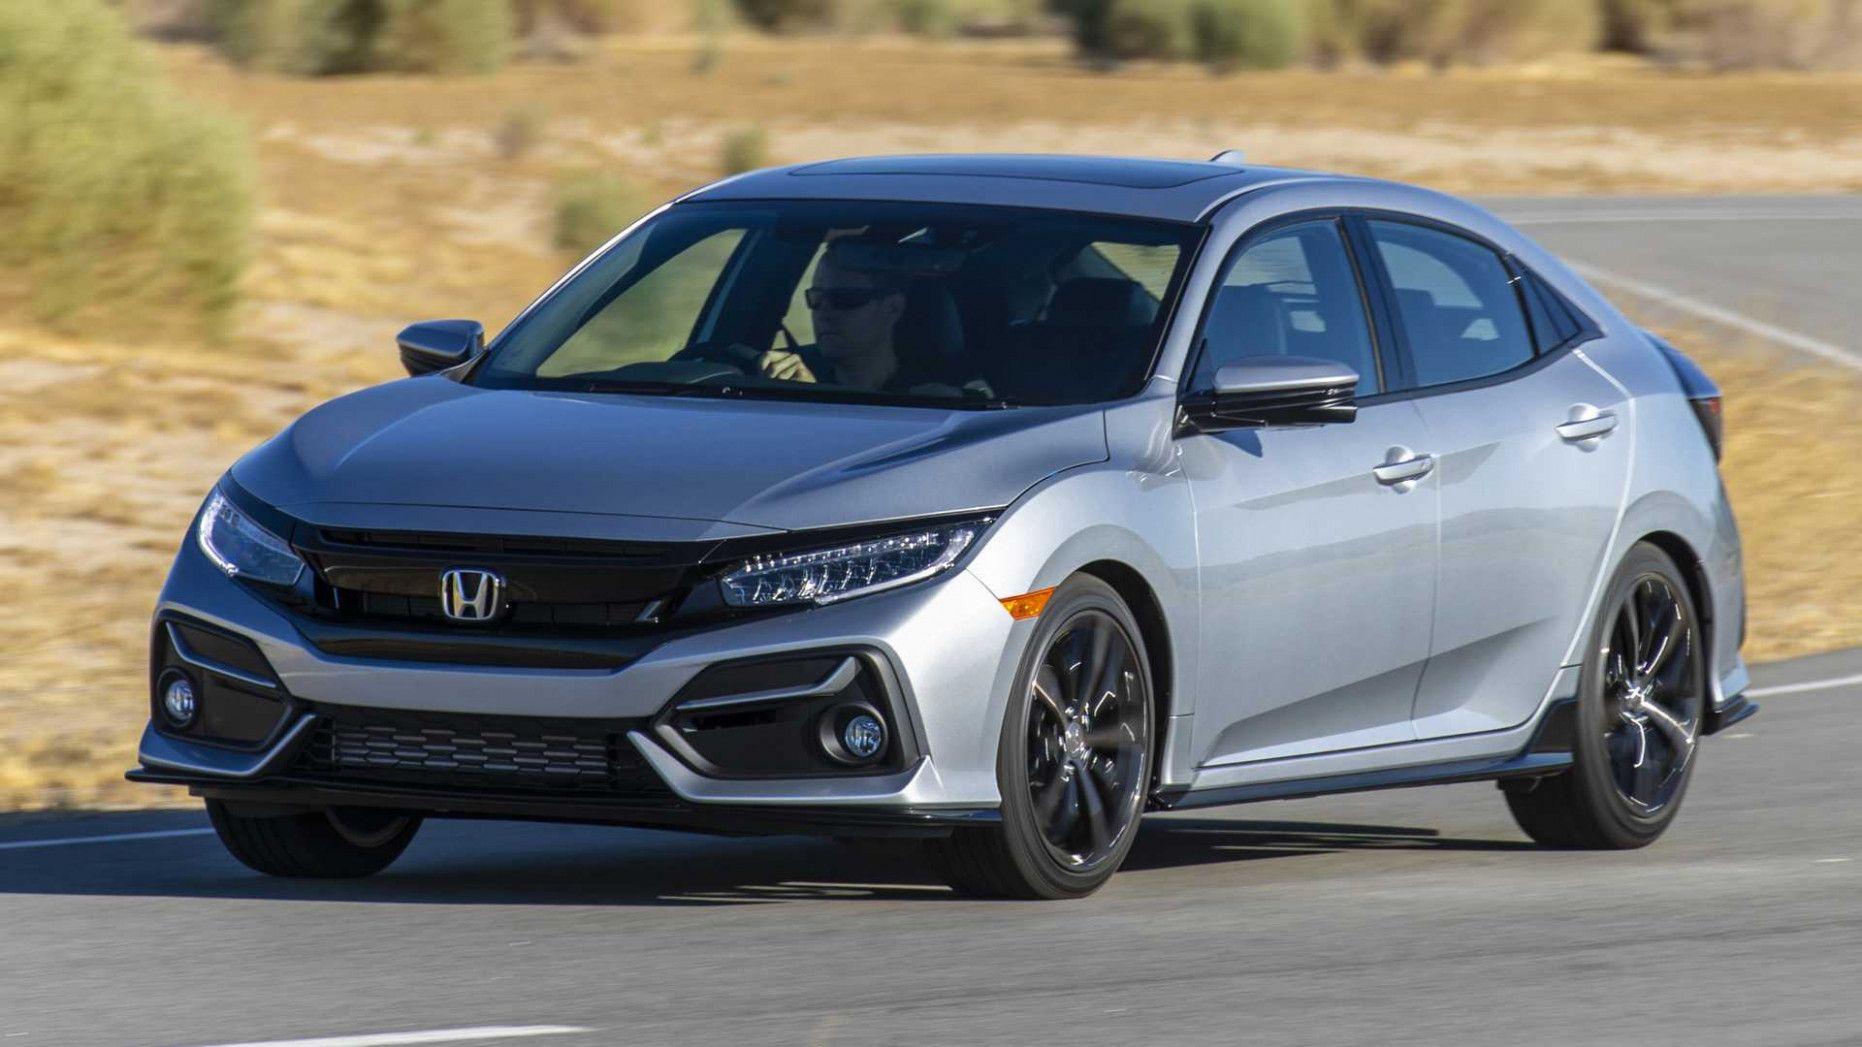 Ten Advantages Of 2020 Honda Hatchback And How You Can Make Full Use Of It Civic Hatchback Honda Civic Hatchback Honda Hatchback